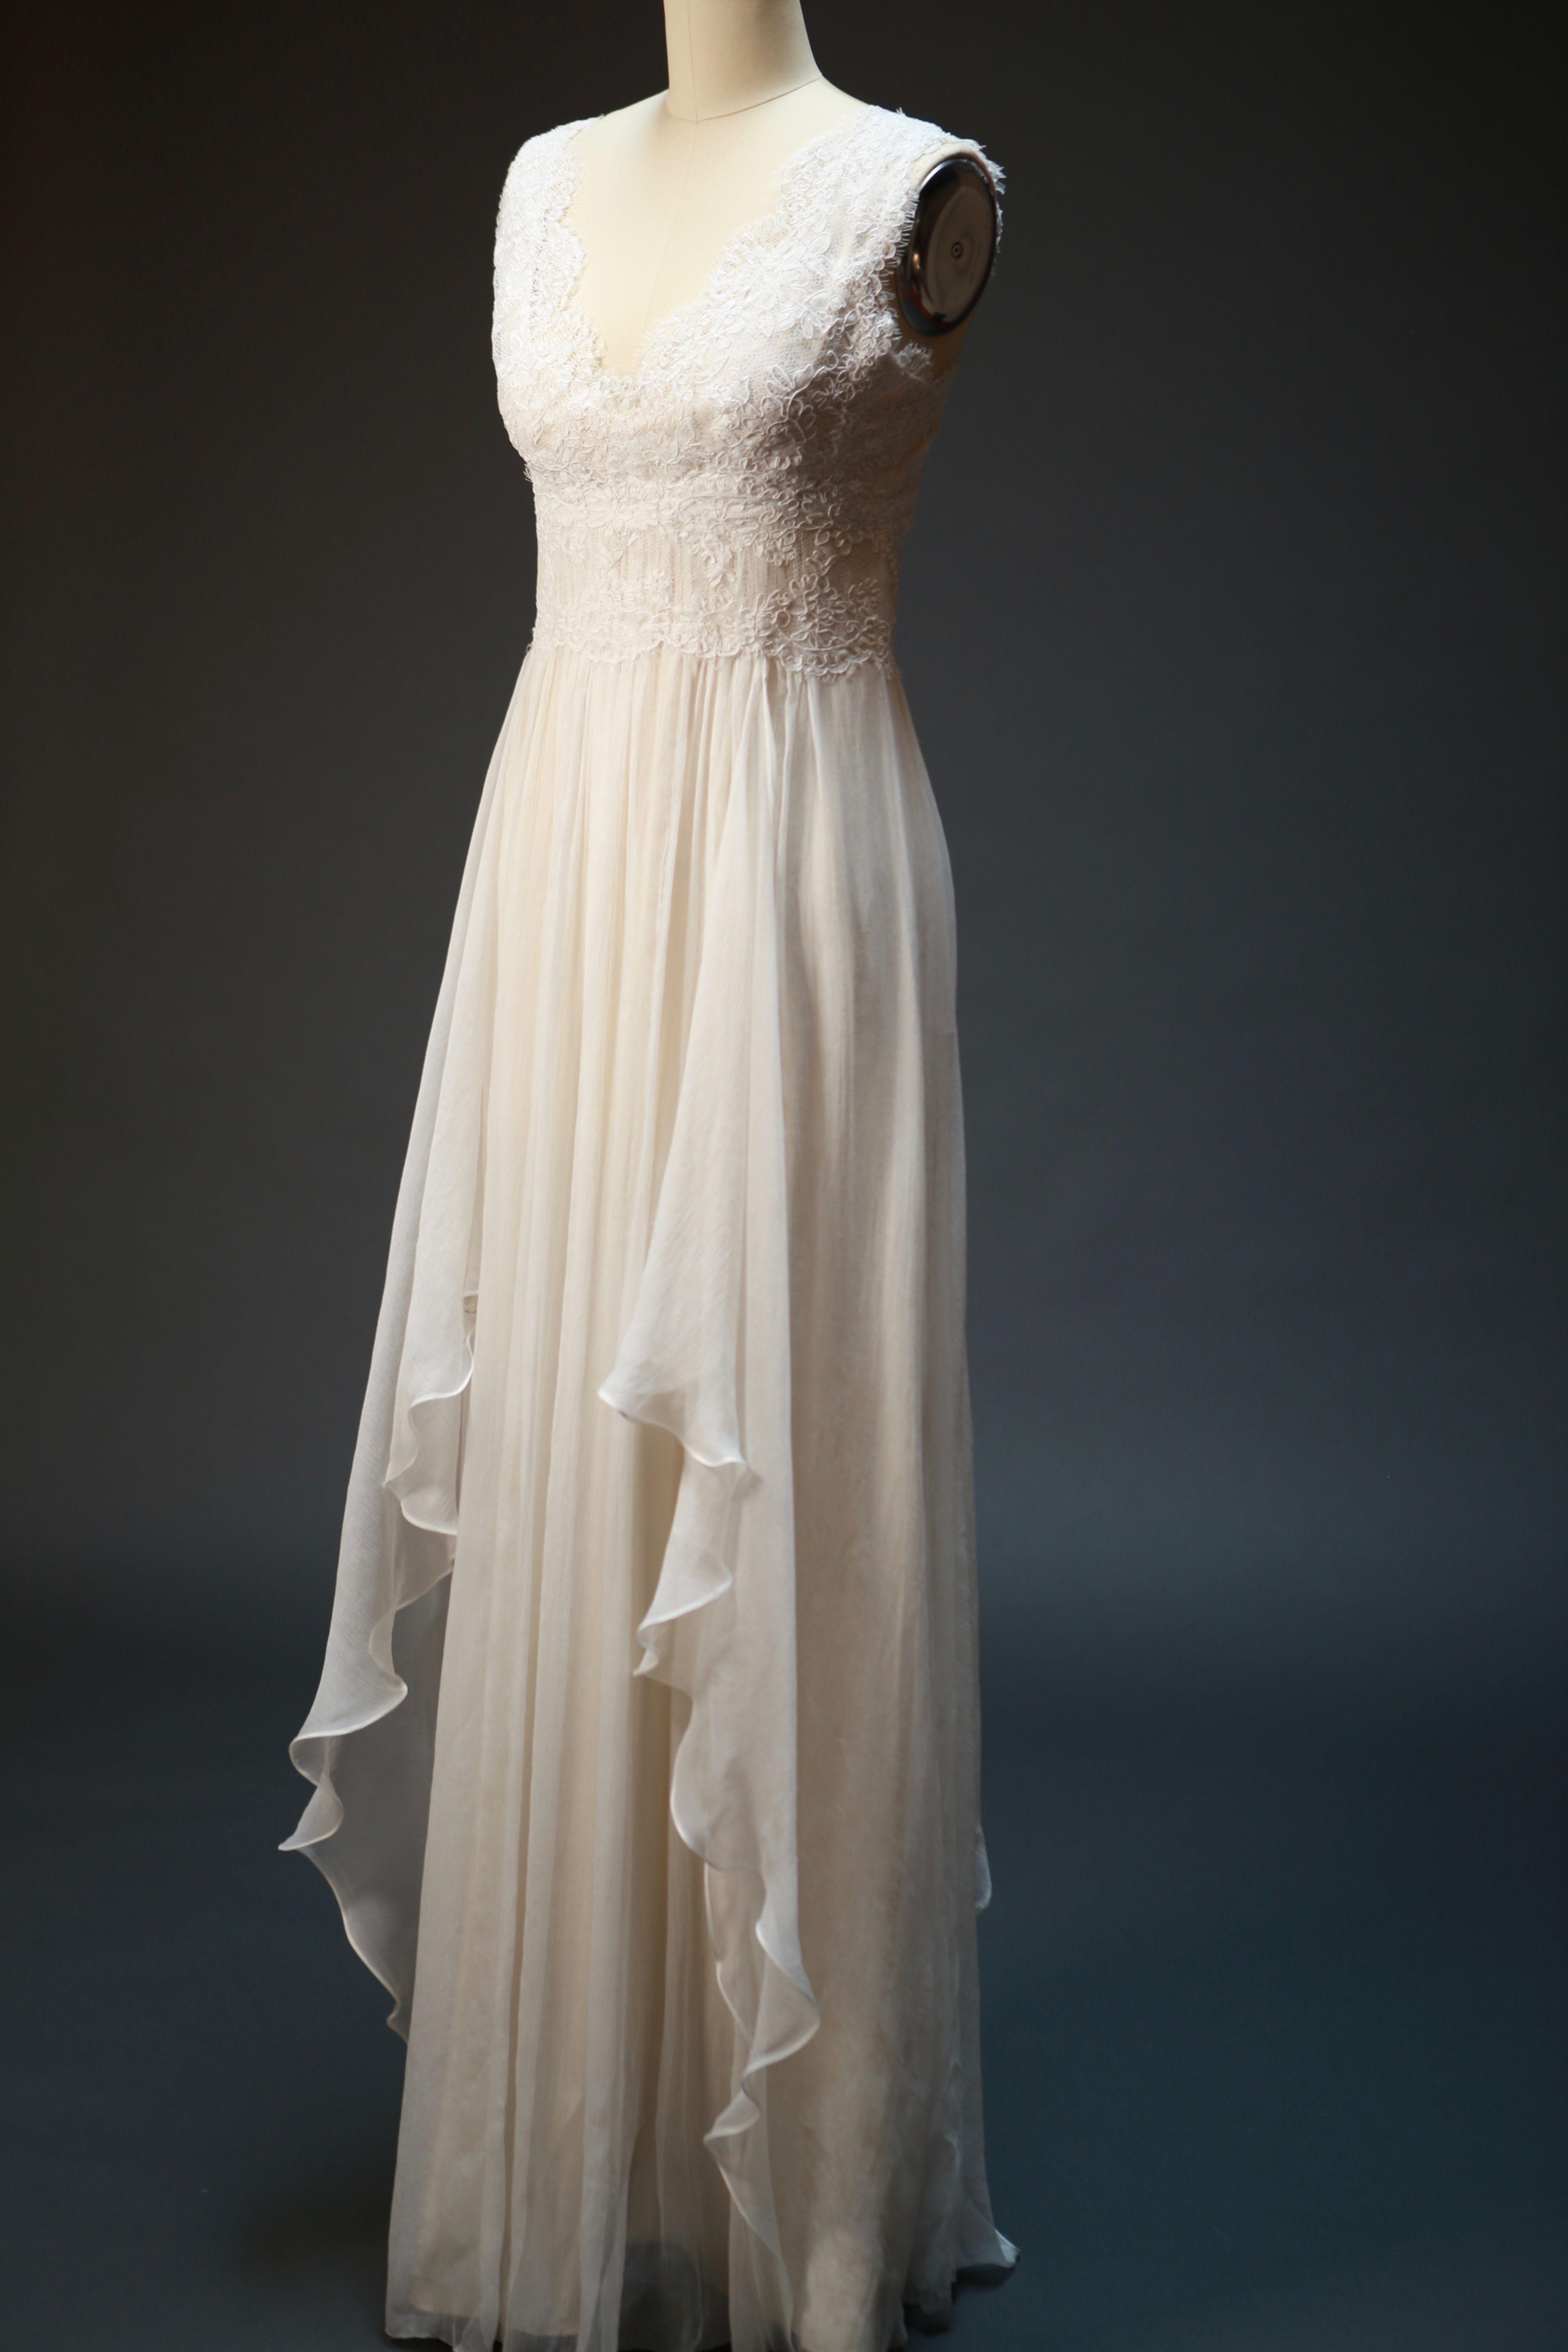 ON Airy Handkerchief Skirt Lace Wedding Dress in Wedding